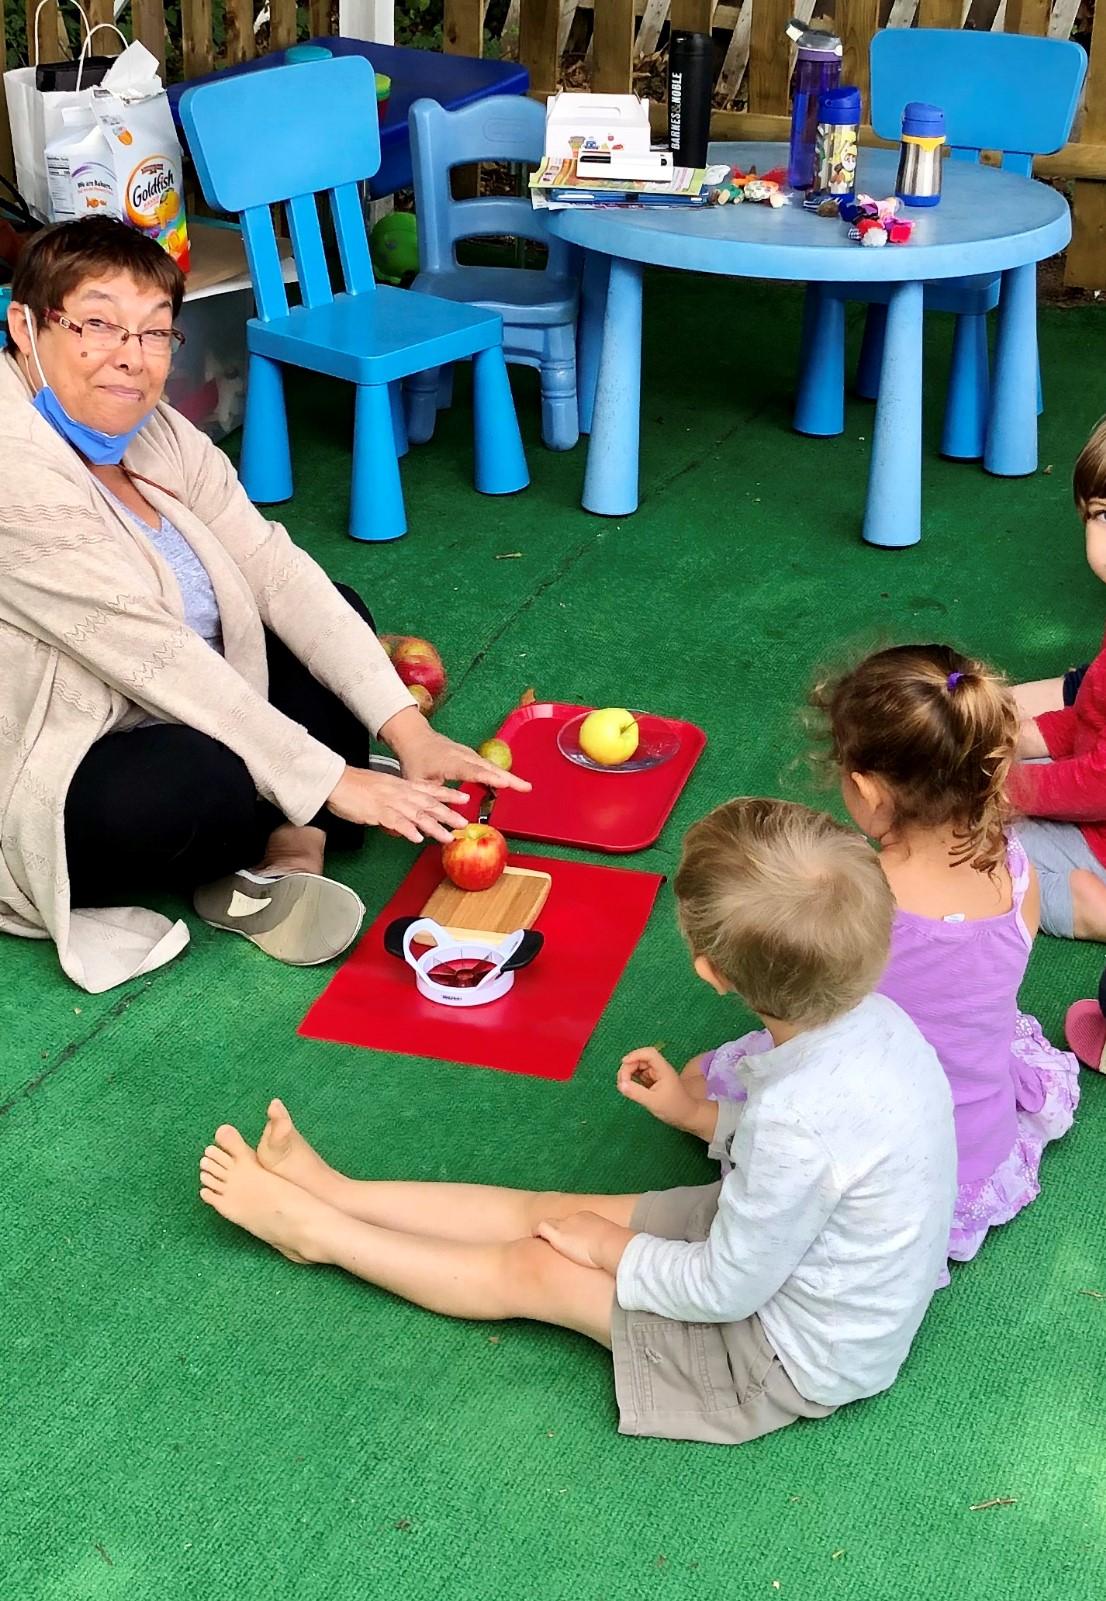 Women with children cutting apples